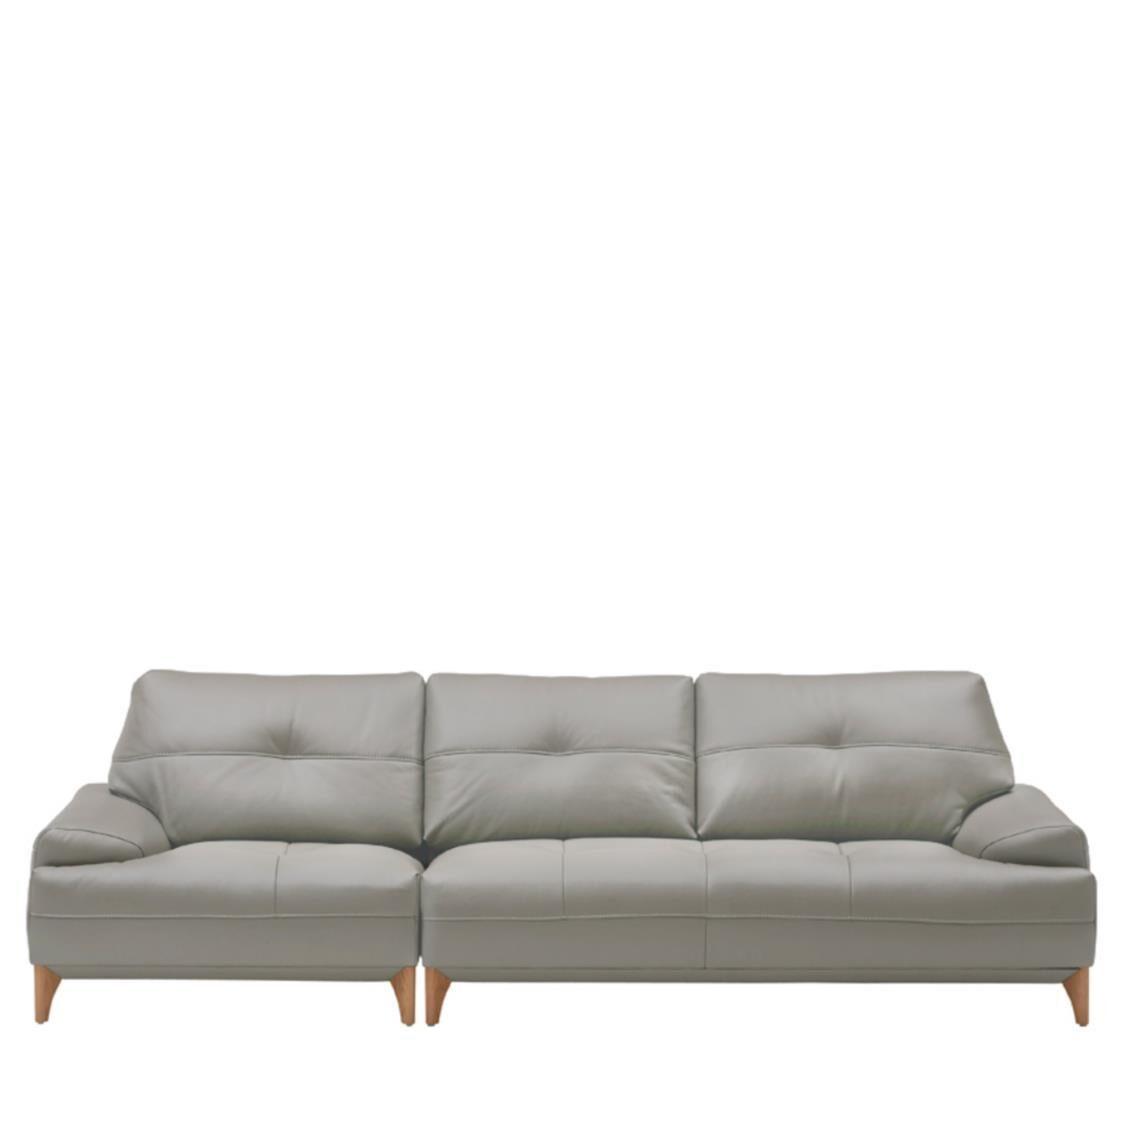 Iloom Boston Leather Sofa For 4  L391C Cloud